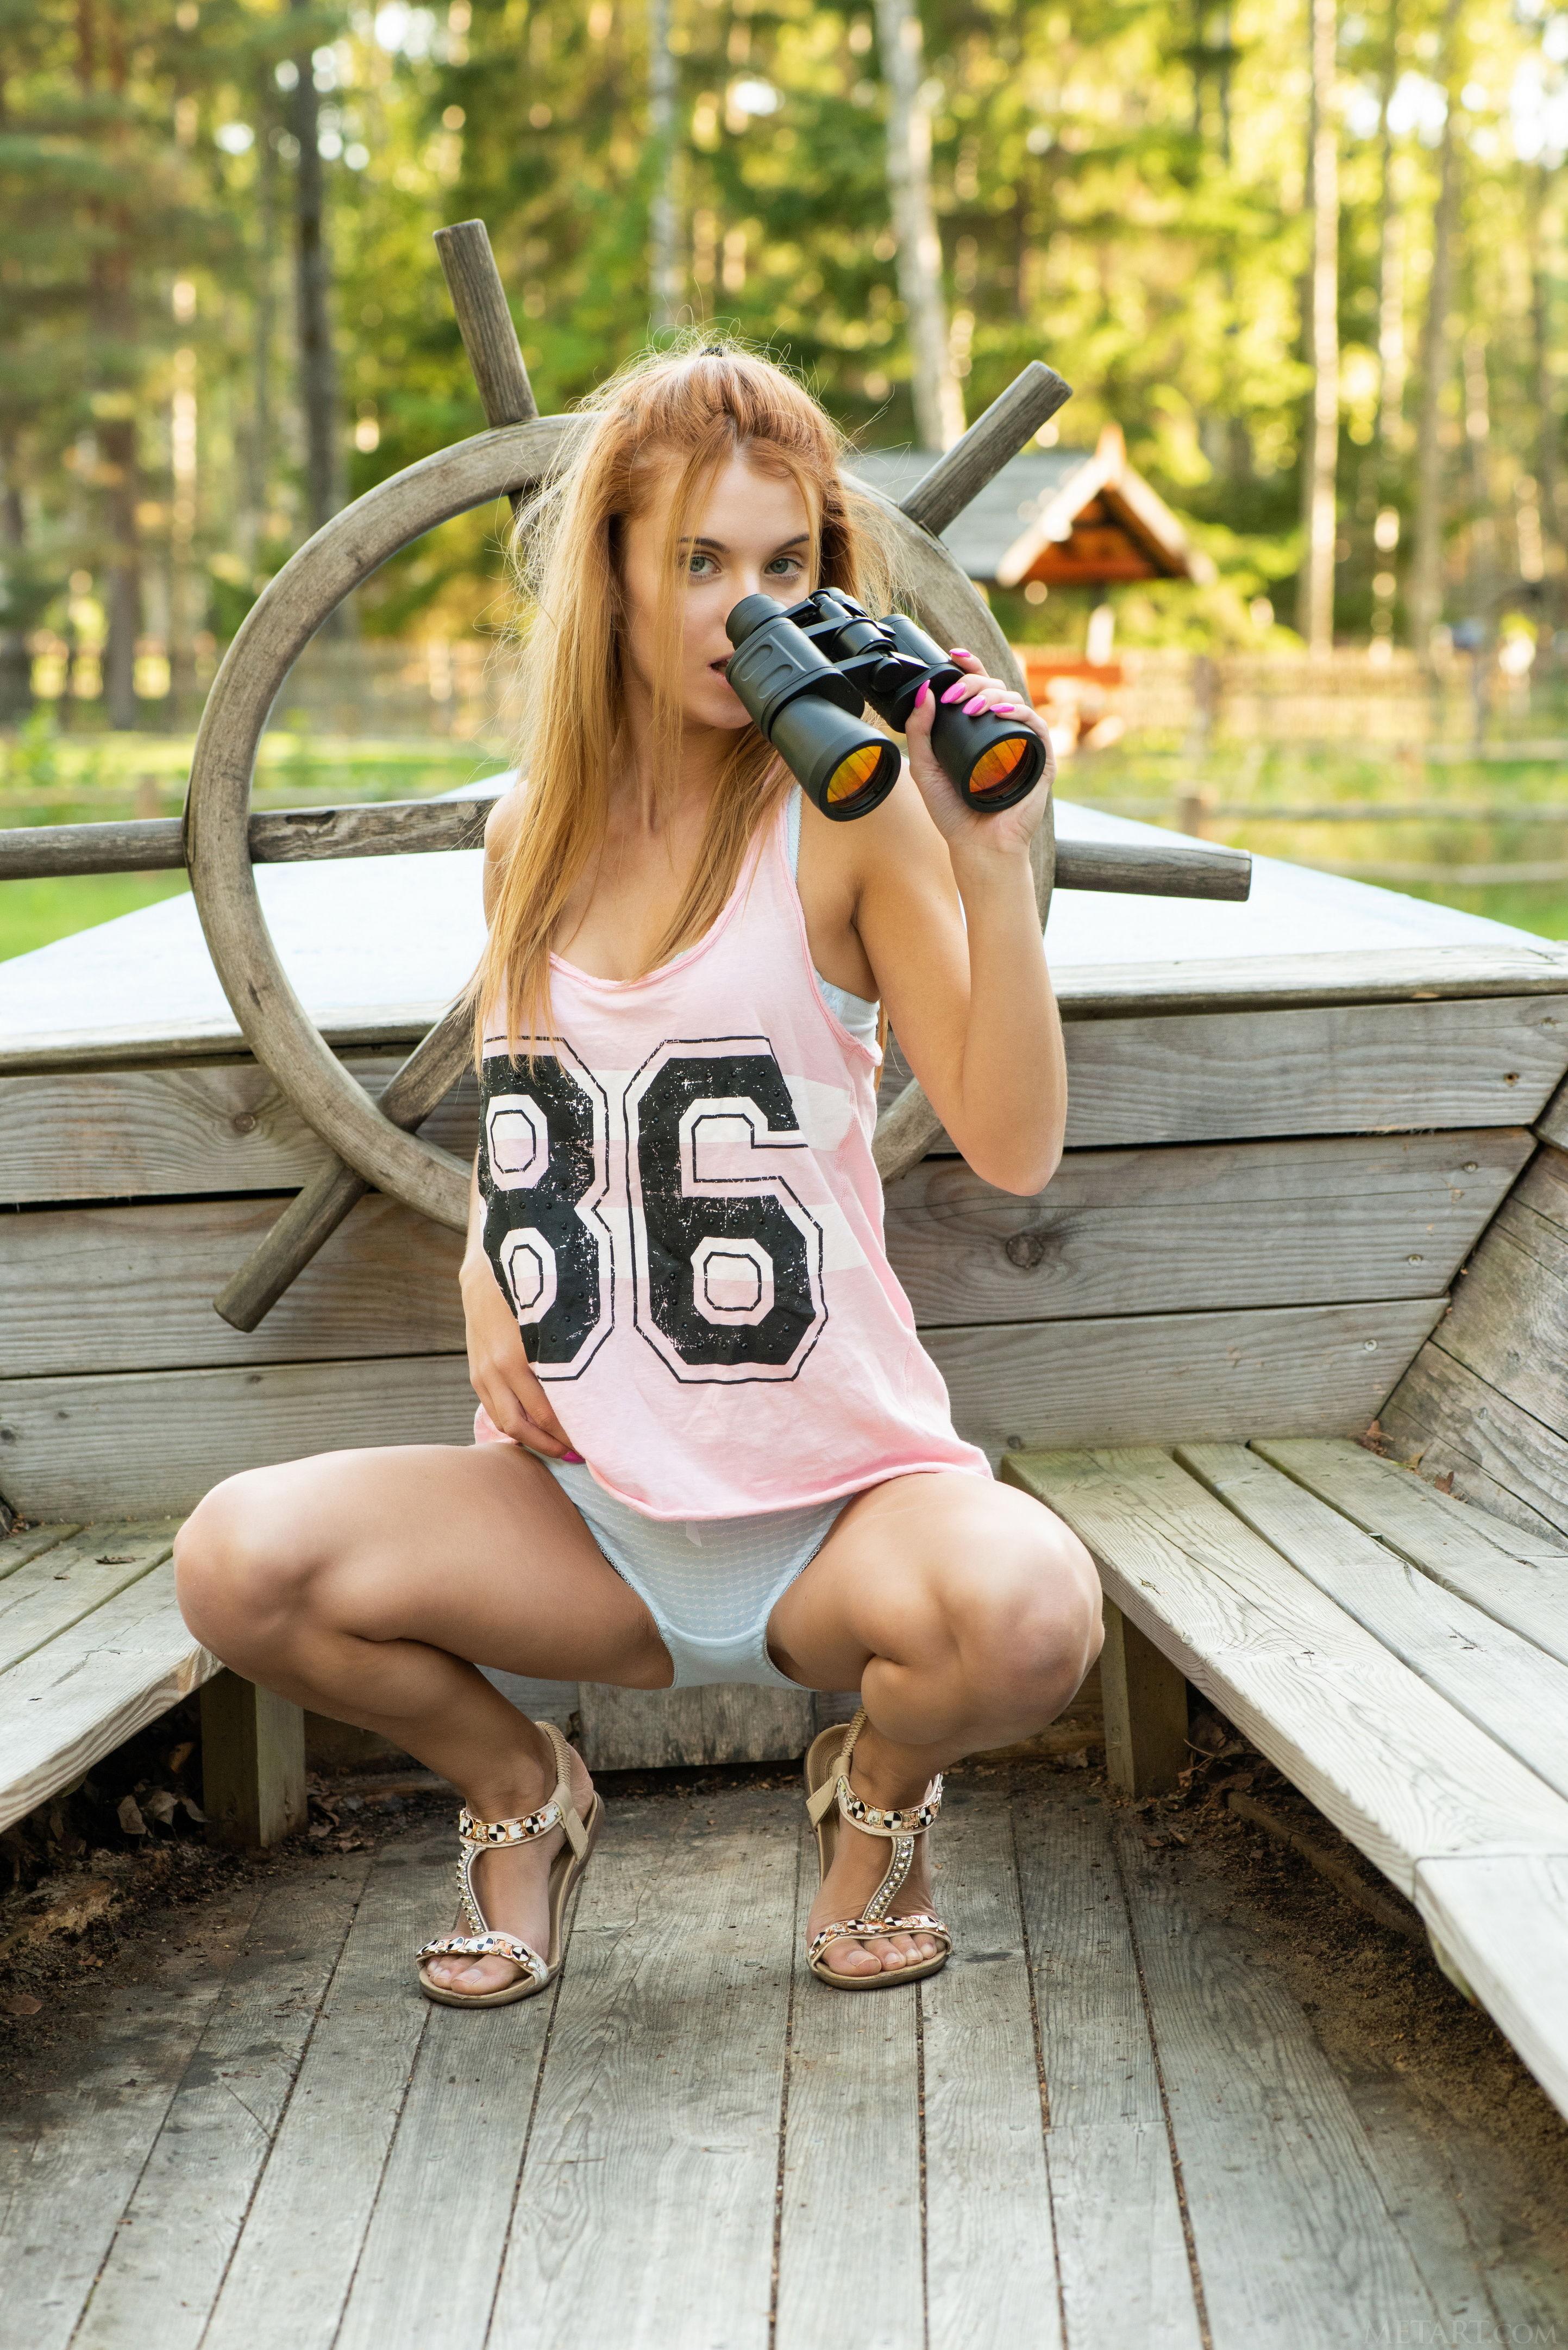 People 2886x4324 women blonde long hair boat swamp wood binoculars blouse green eyes MetArt Magazine Ingrid (Model) spread legs panties squatting